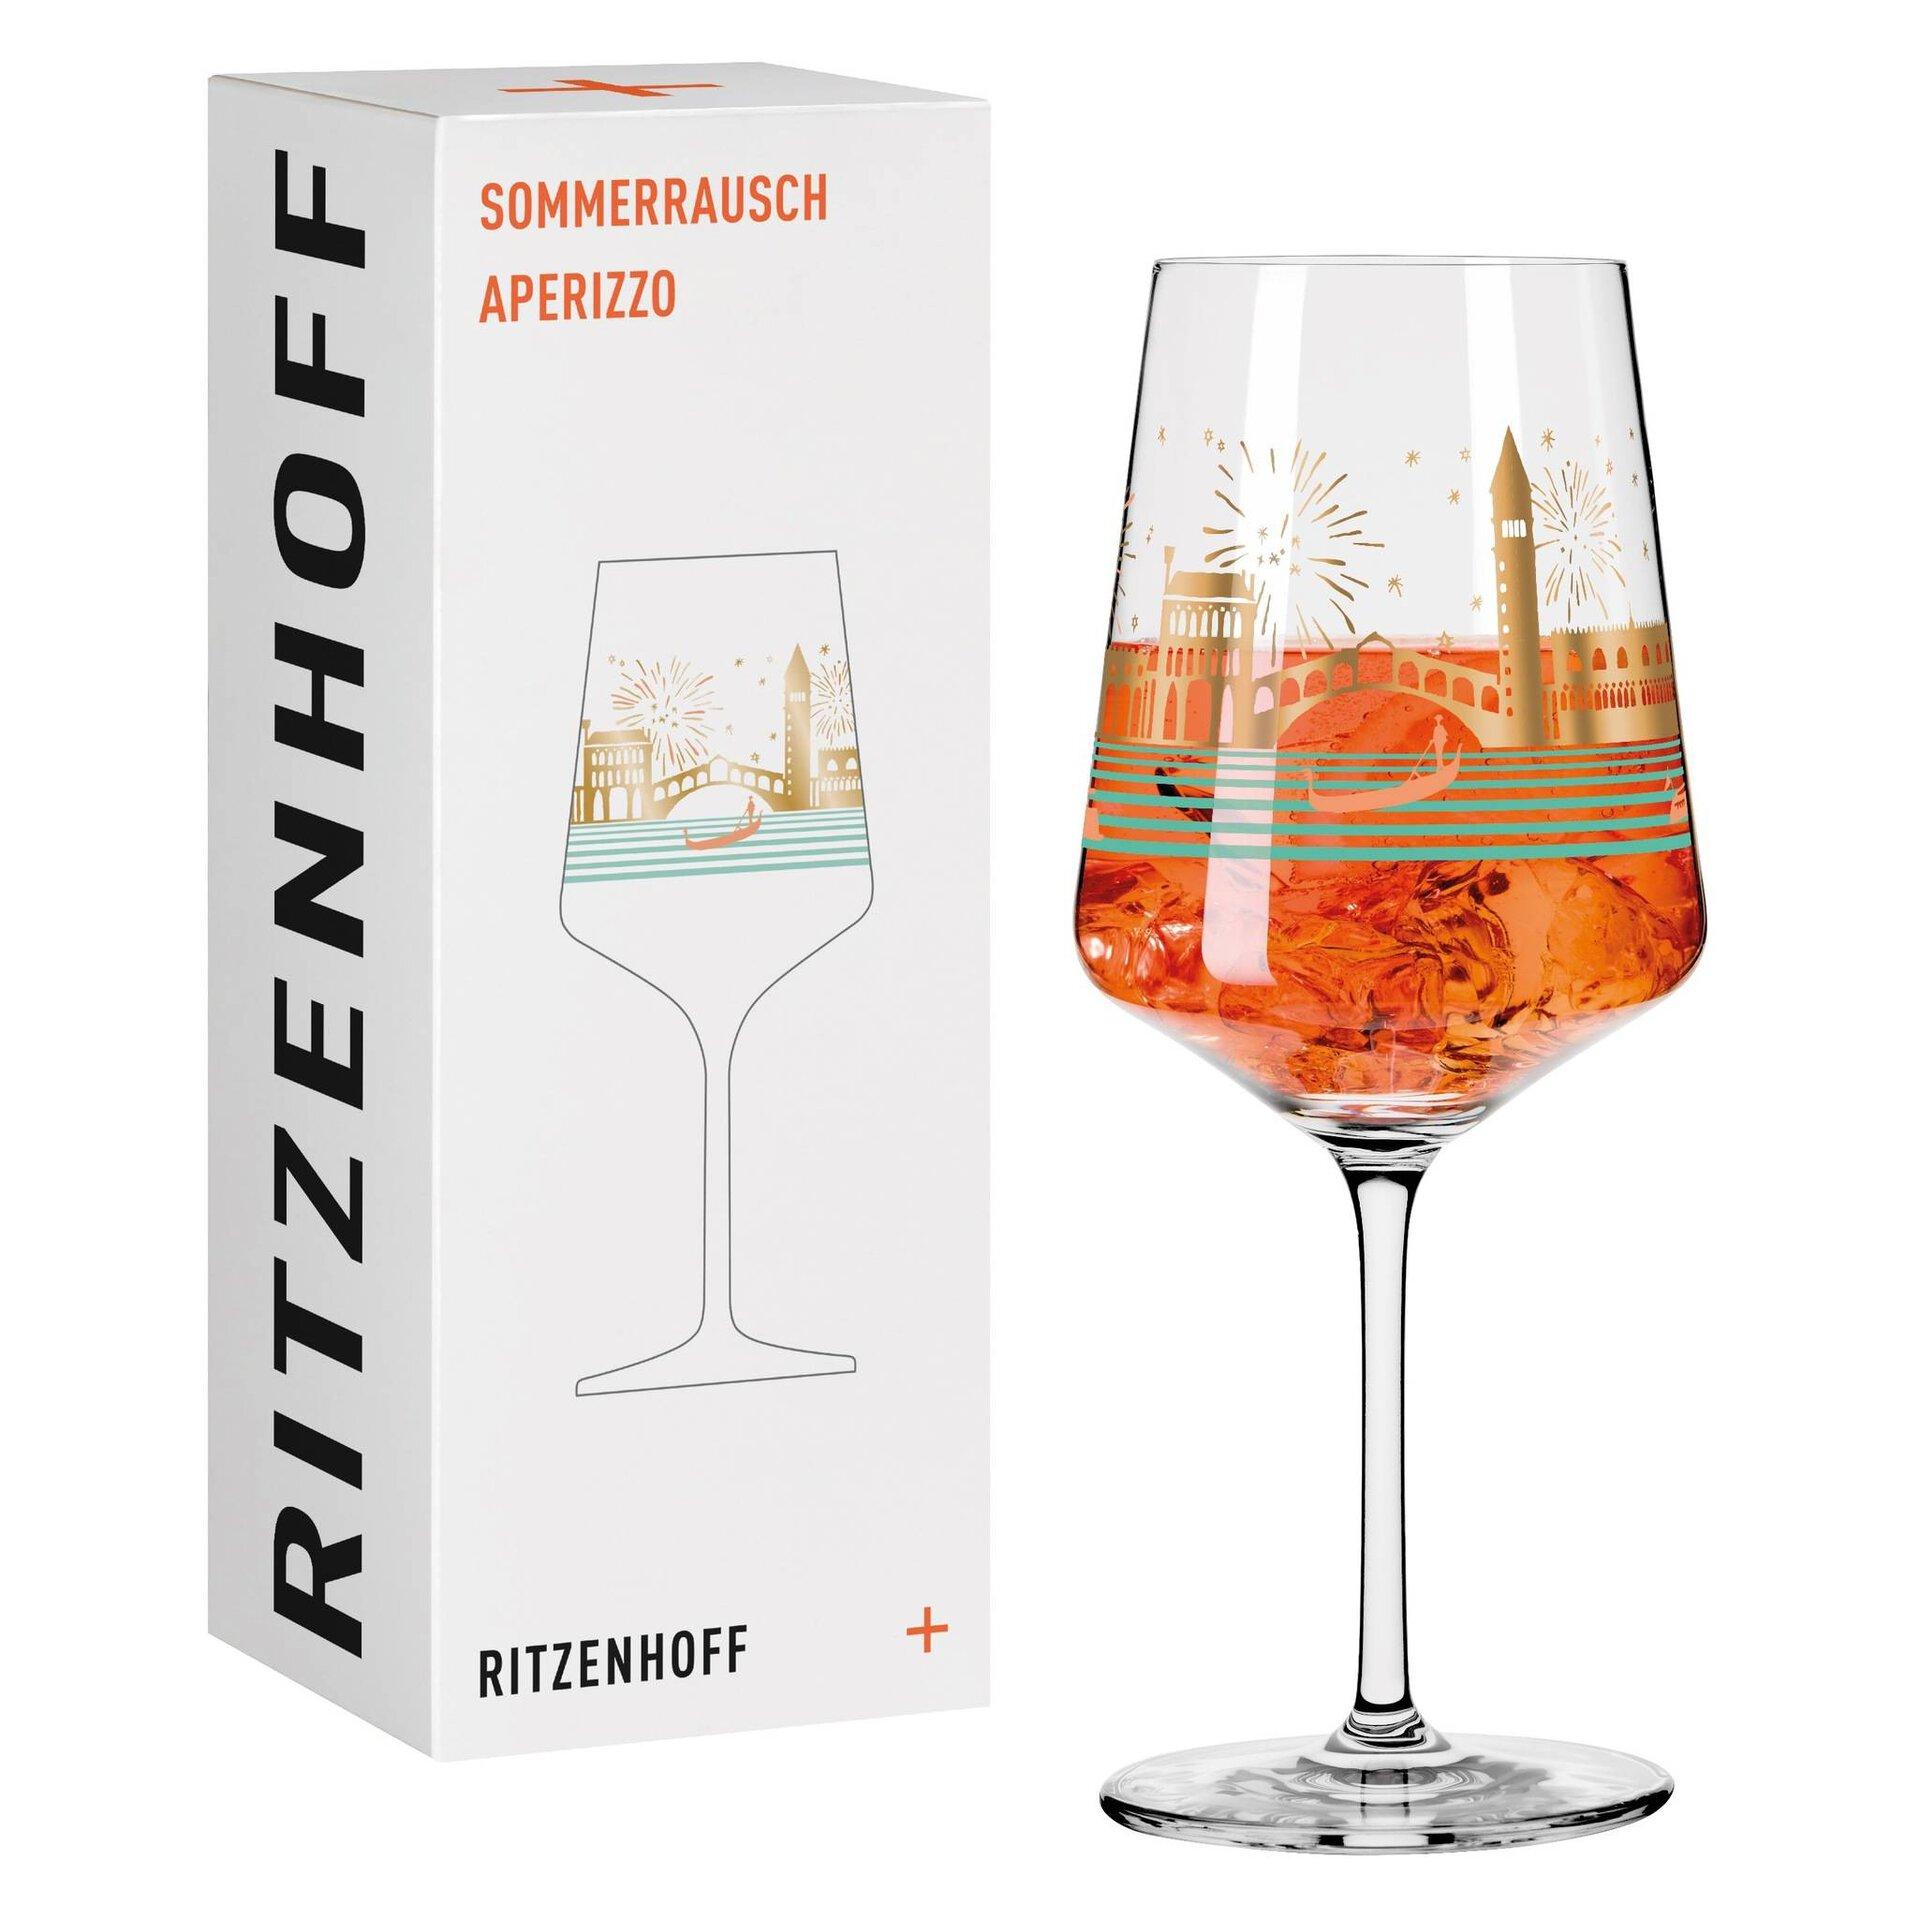 Aperitifglas Sommerrausch Aperizzo 004 Ritzenhoff Glas 23 x